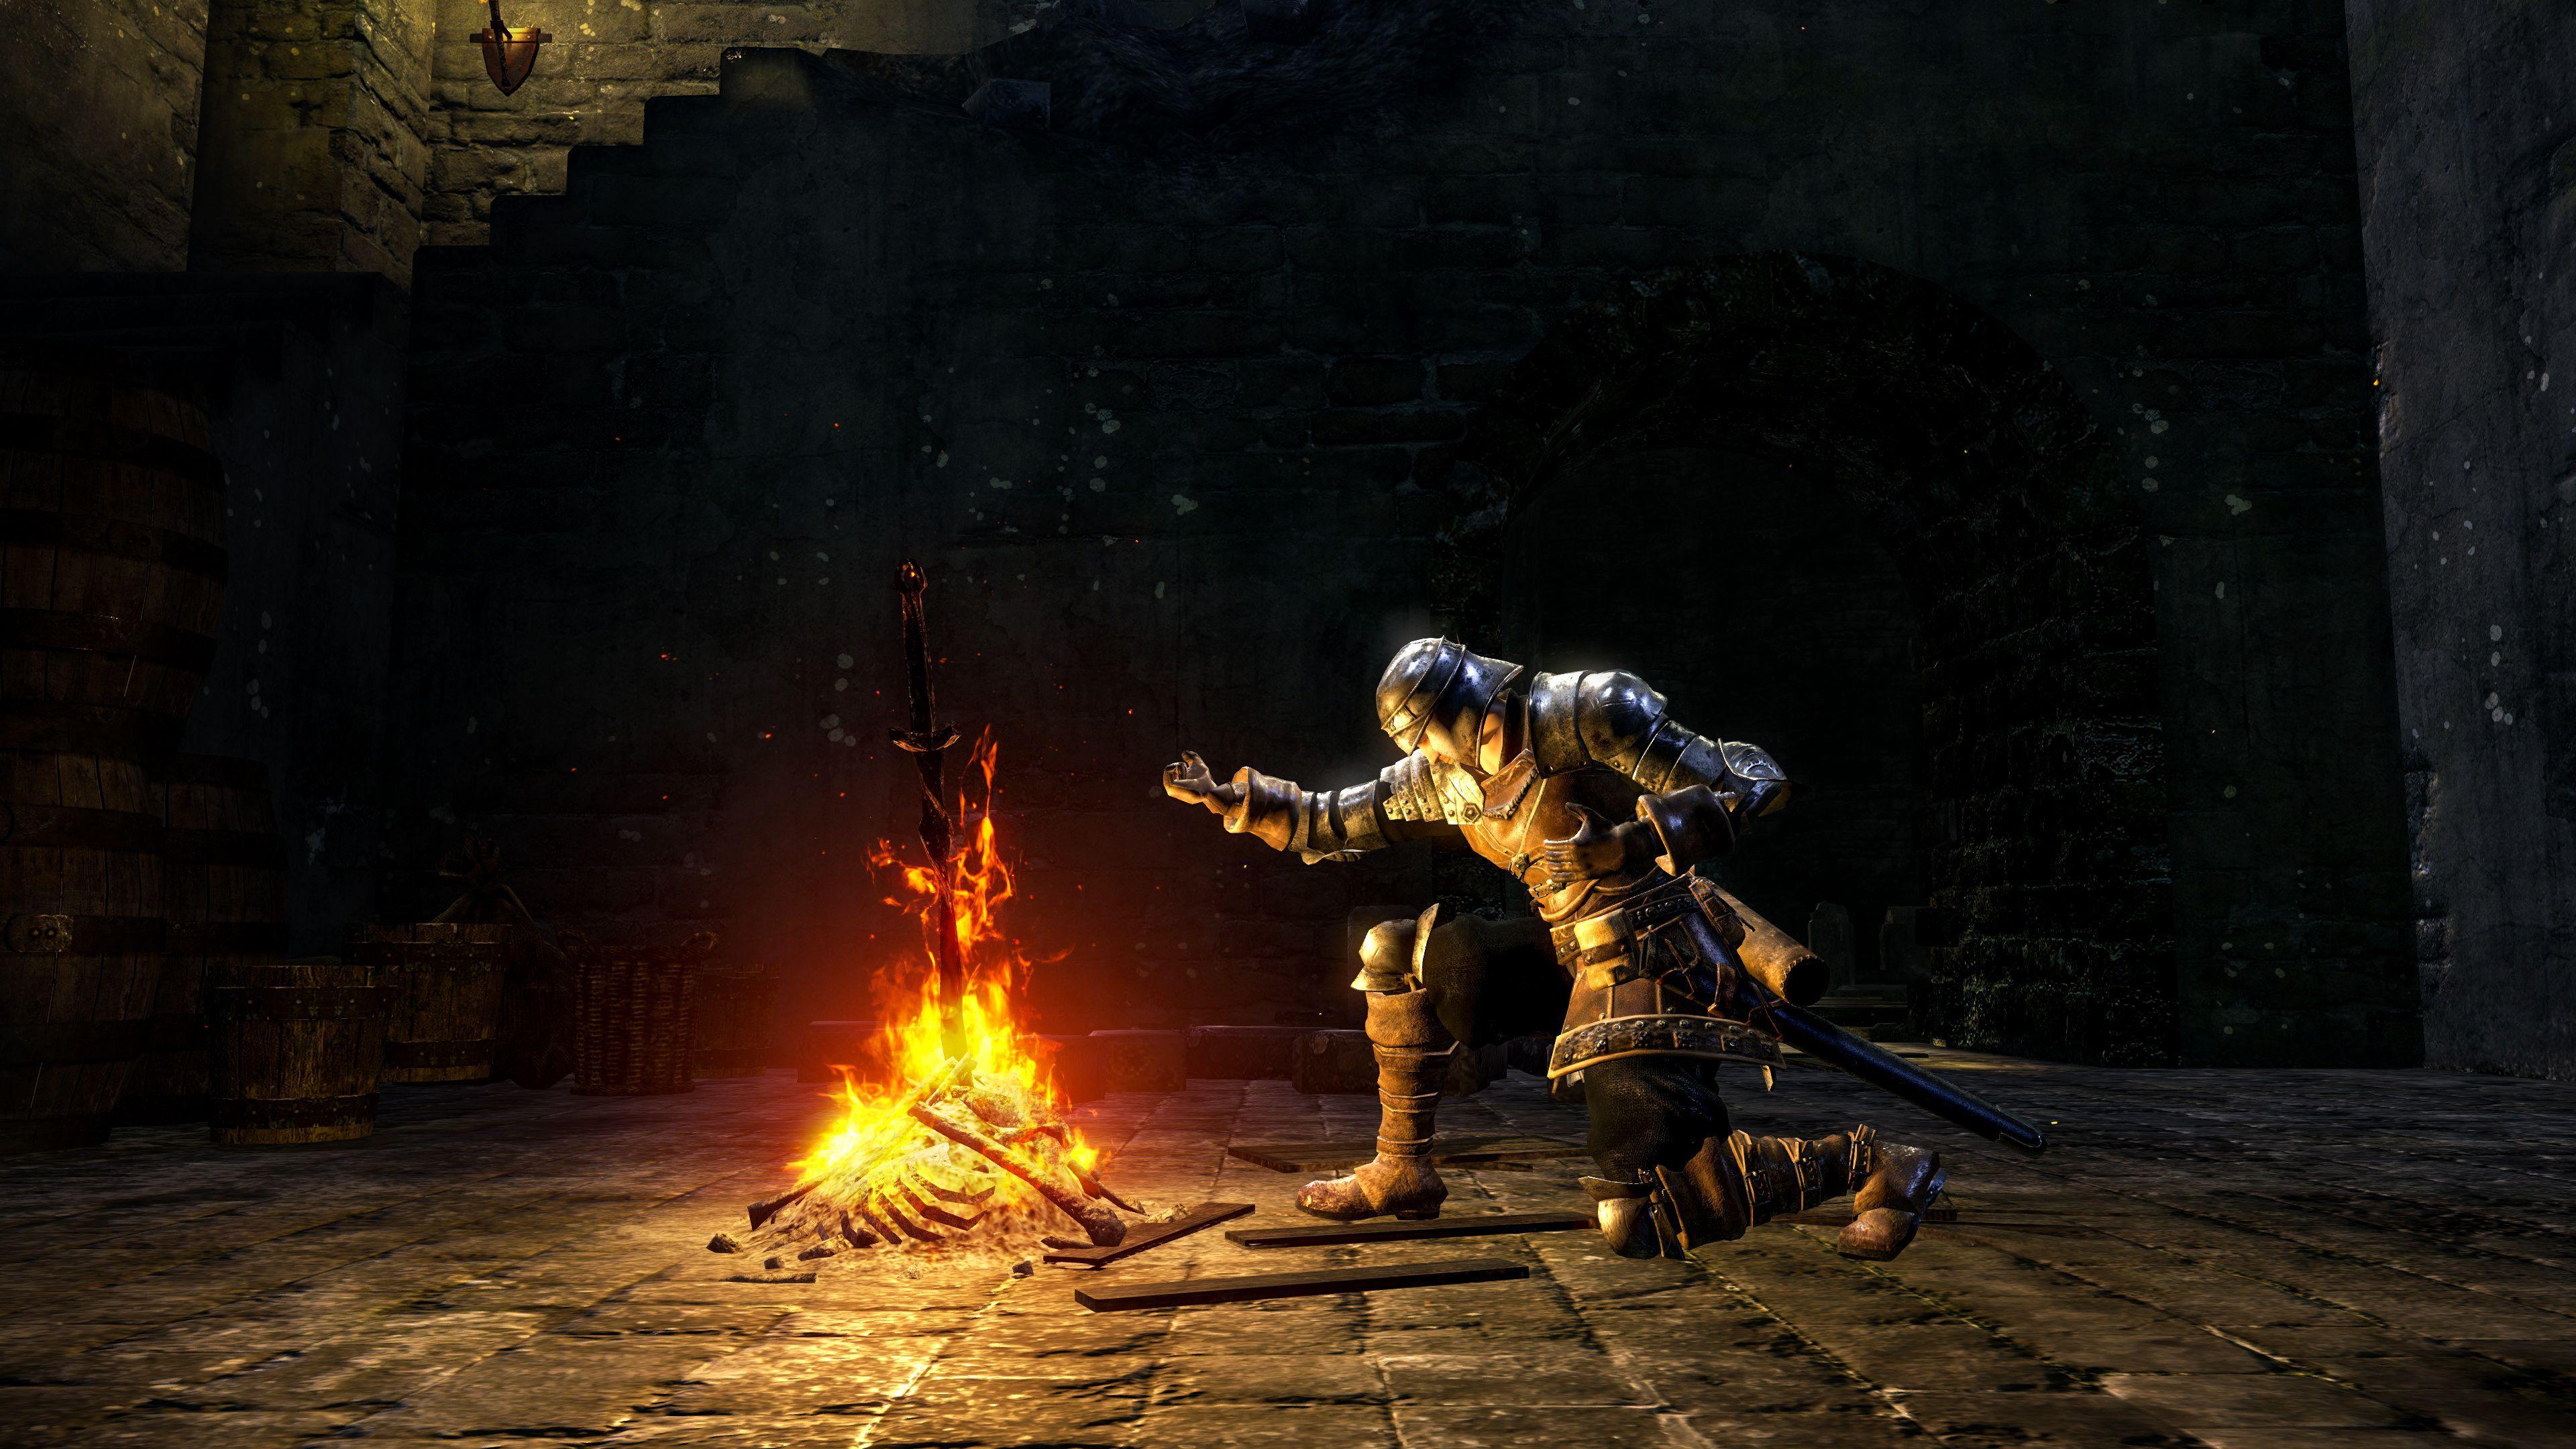 Dark Souls Remastered Wallpapers Wallpaper Cave